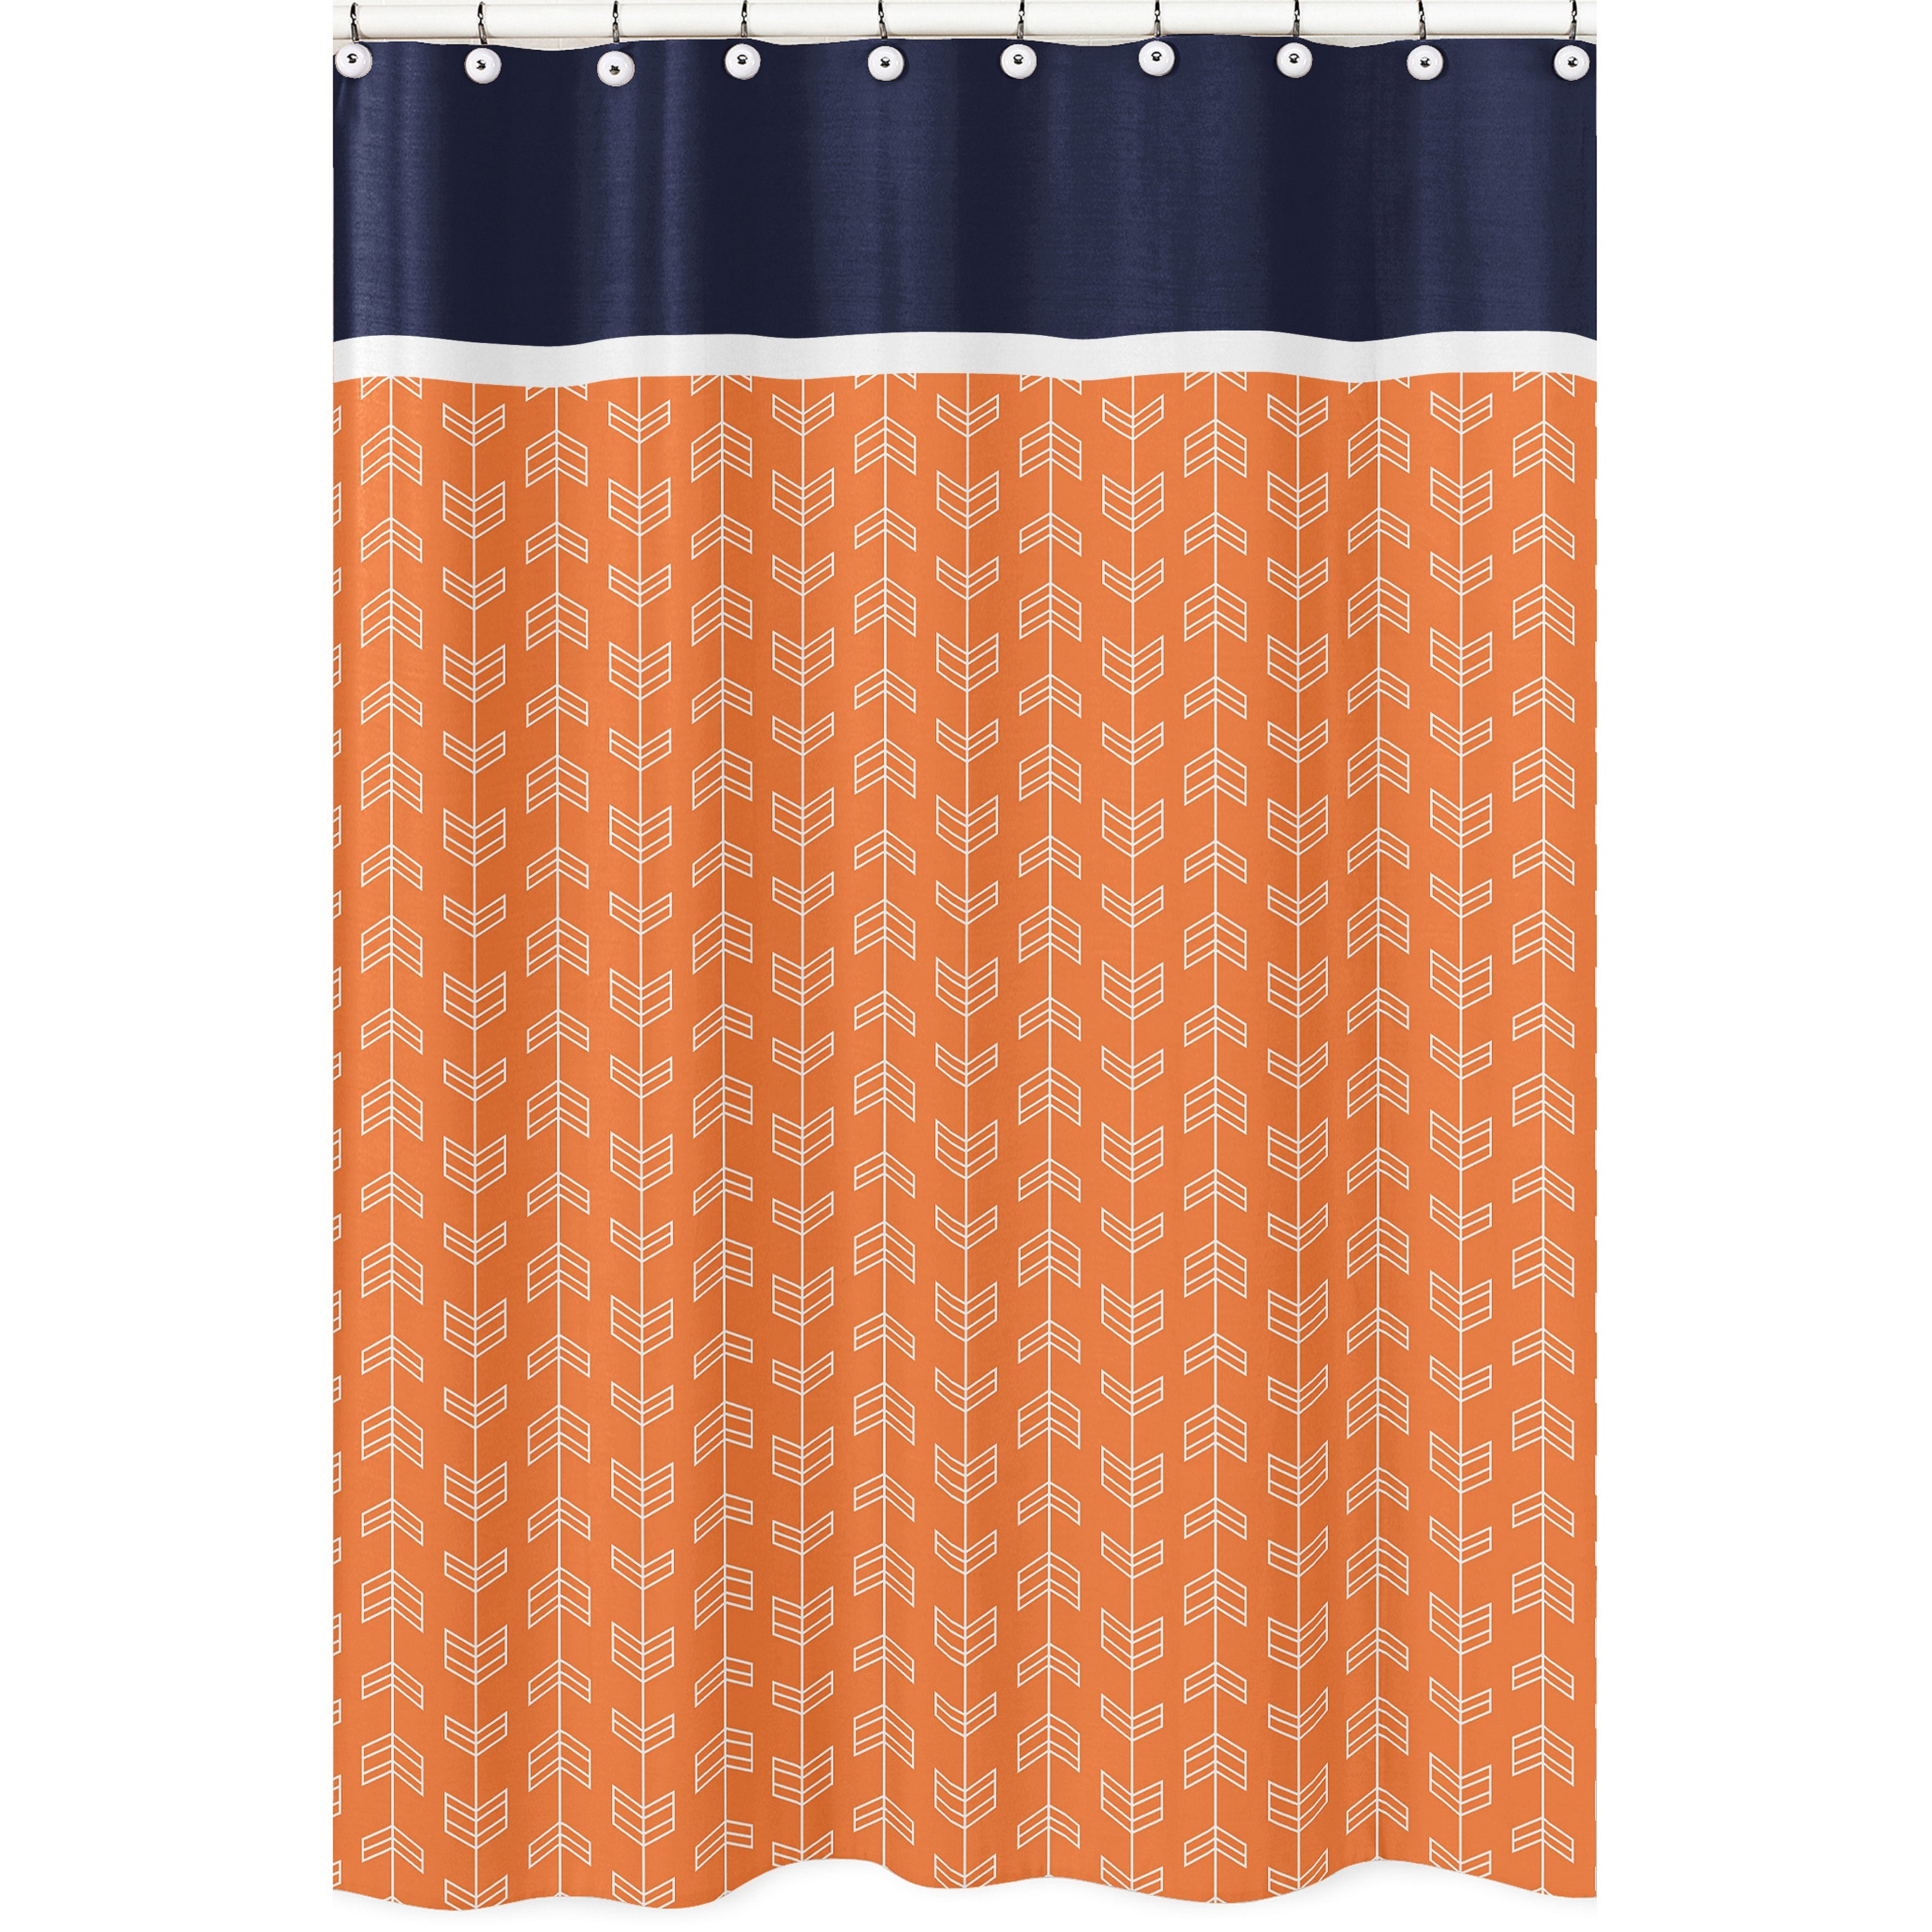 Orange And Navy Blue Arrow Shower Curtain Overstock 12388379